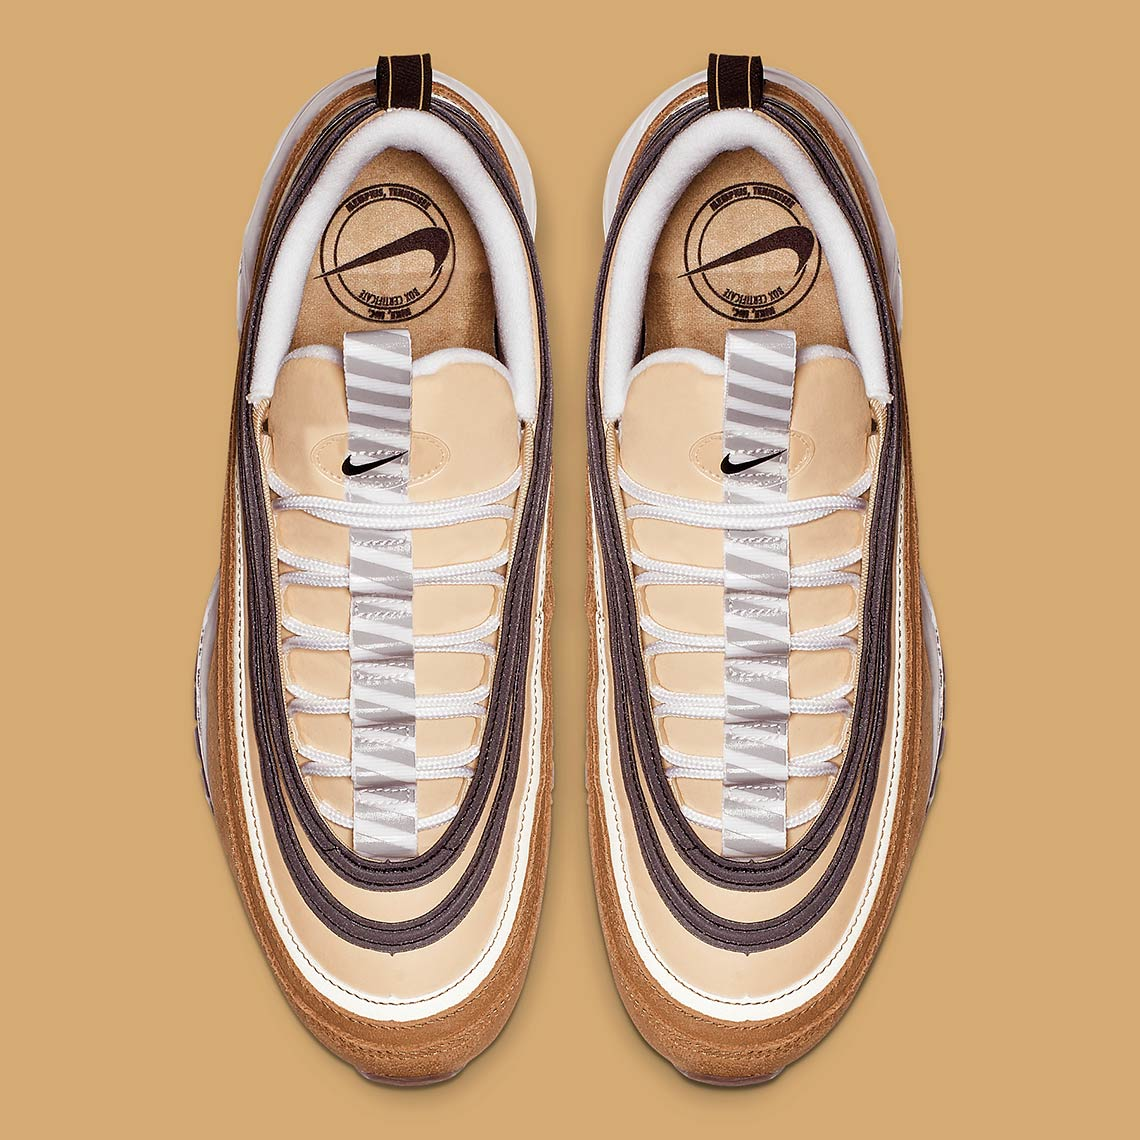 Nike Air Max 97 Bar Code 921826-201